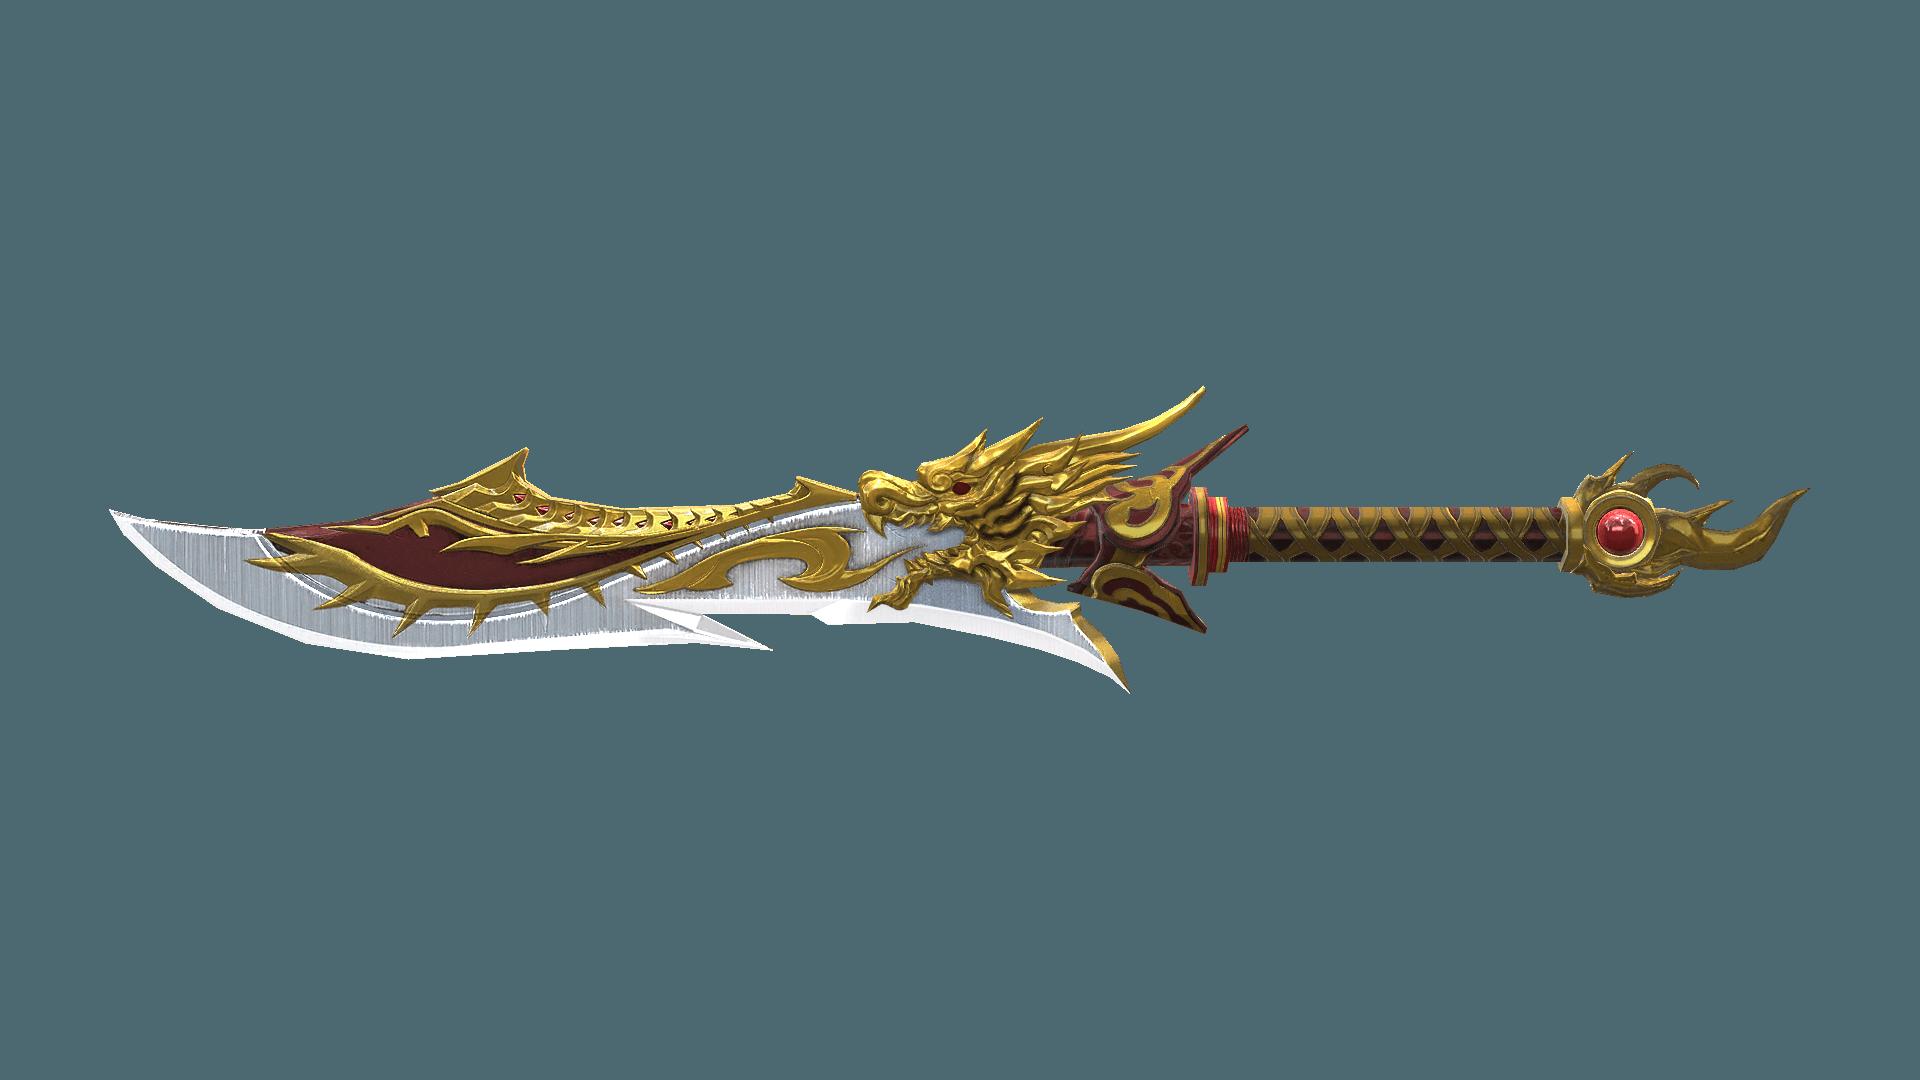 Gold fiery dragon sword baseball players taking steroids